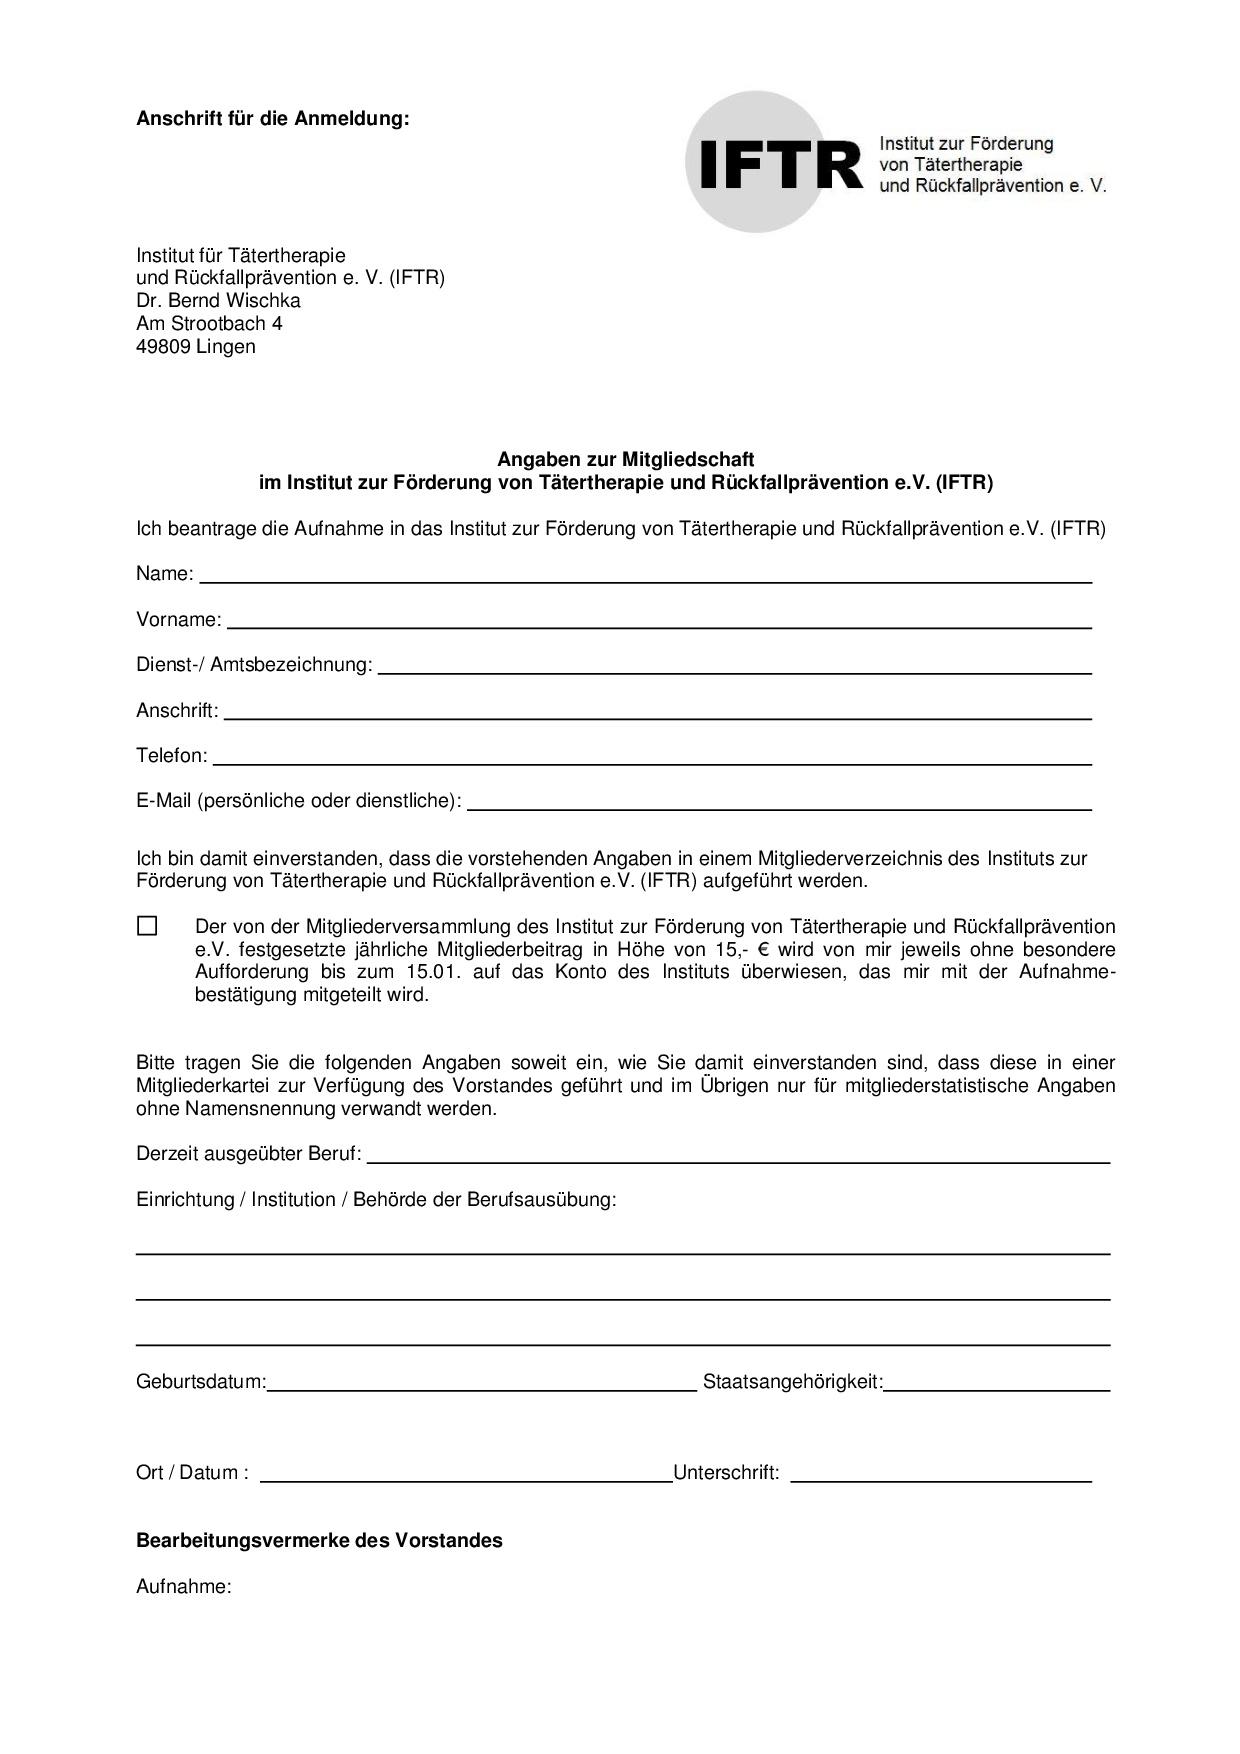 Mitgliedsantrag IFTR